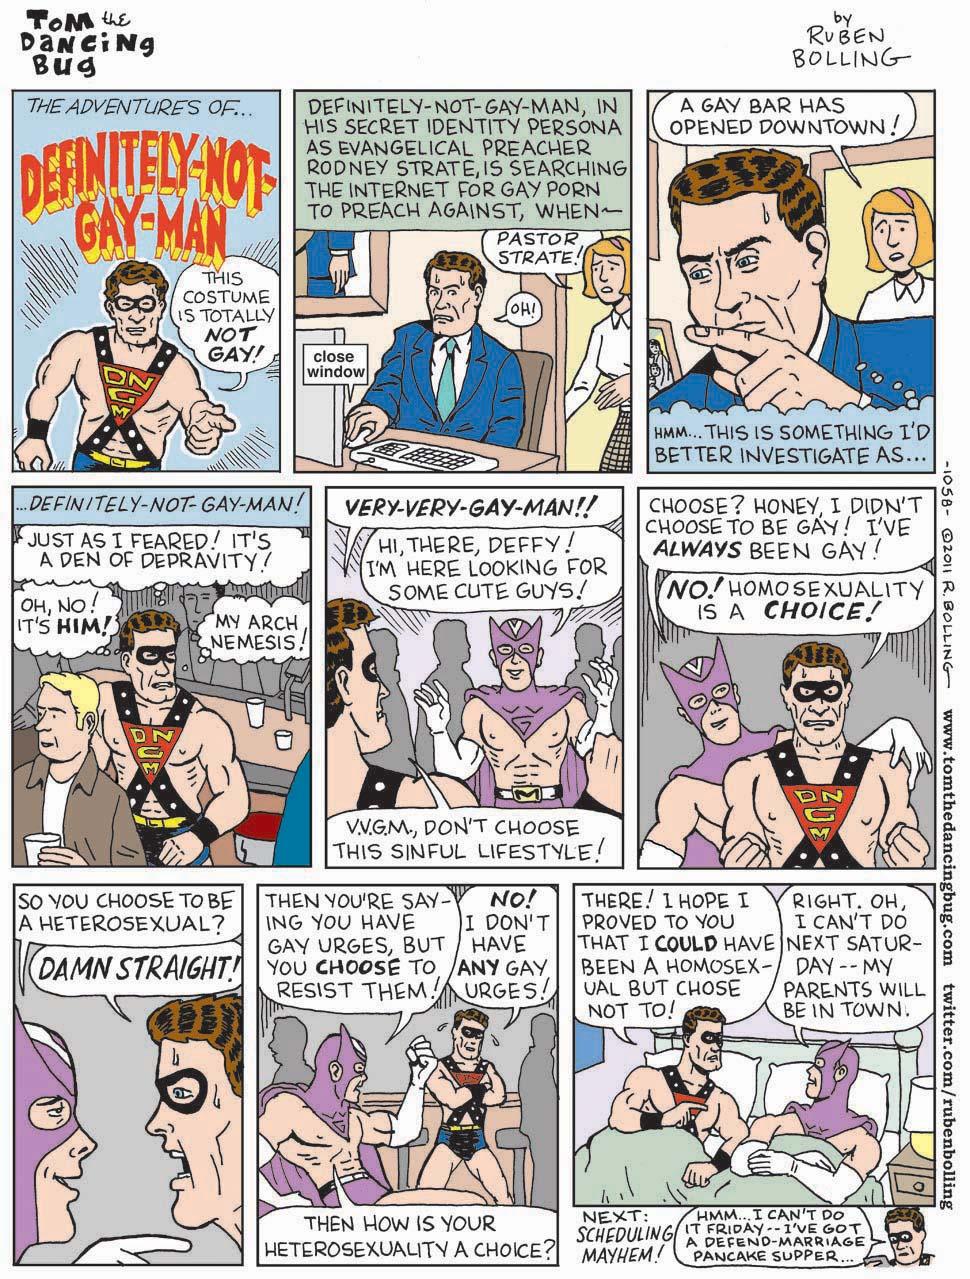 Comic of gay man